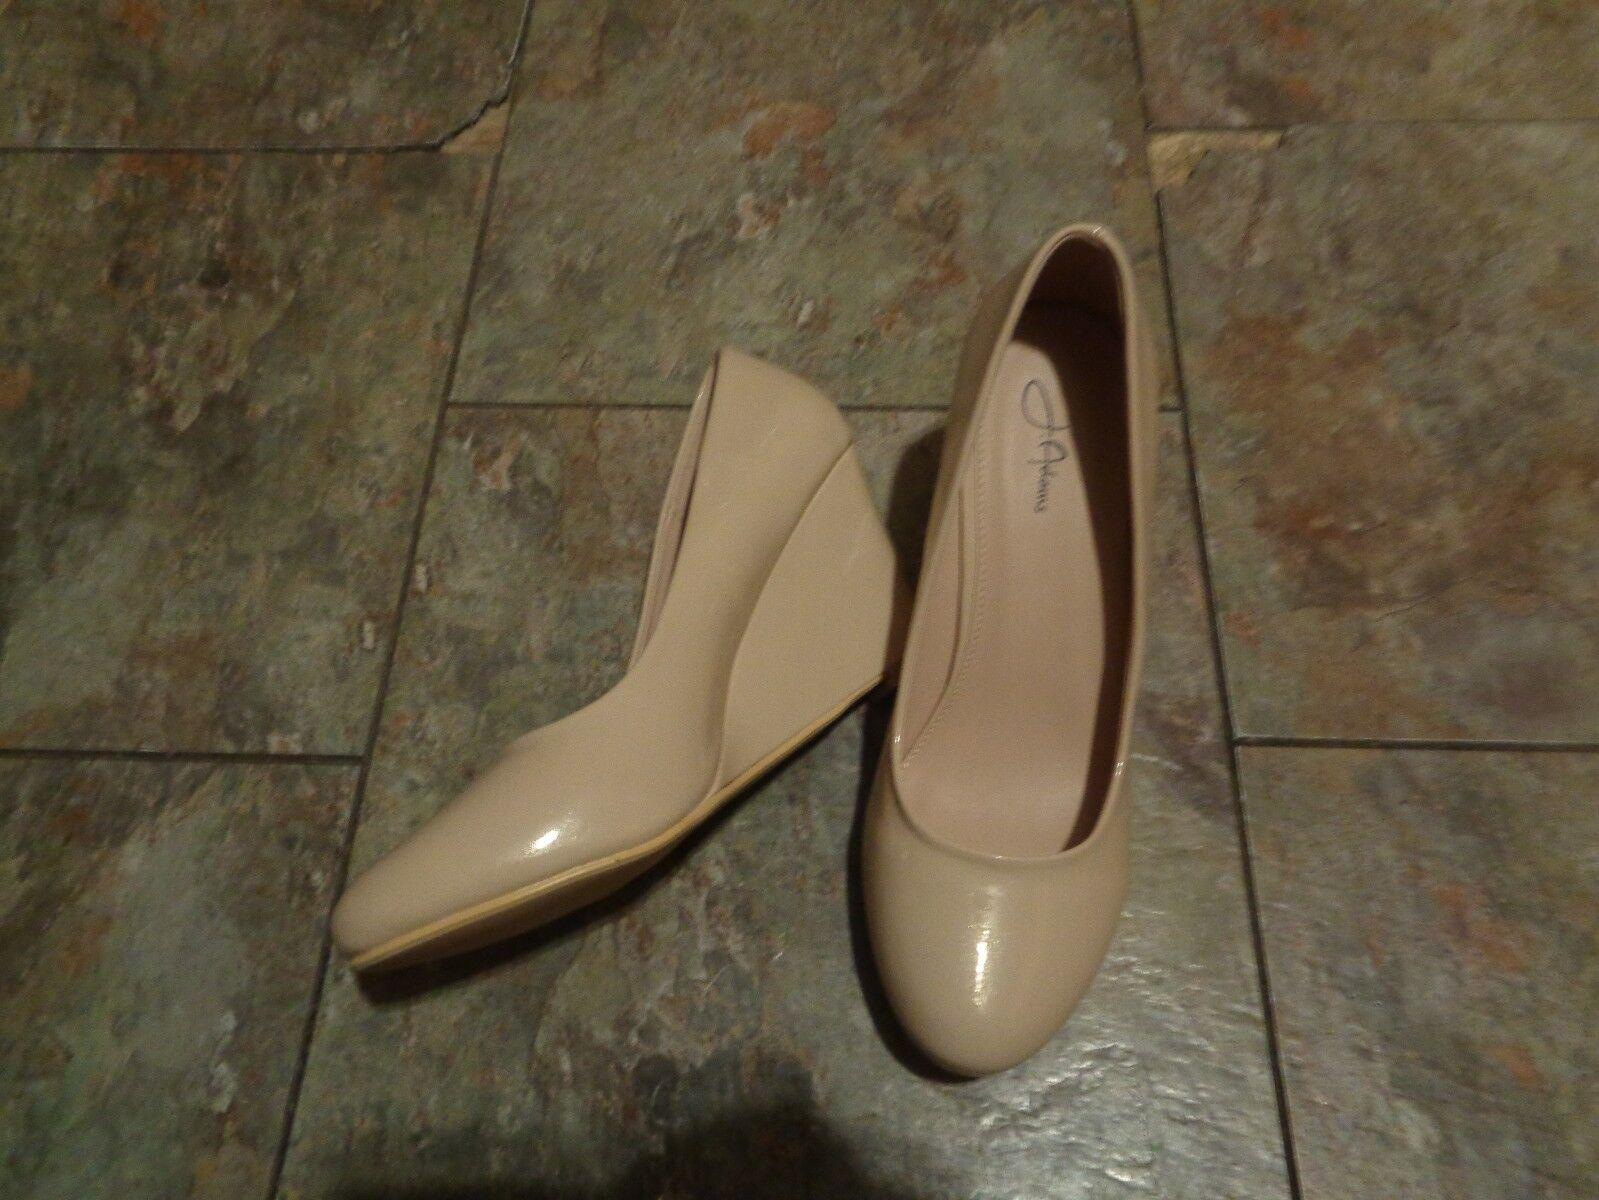 j adams heels nude rounded toe wedge heels adams shoes size 10 3f796e